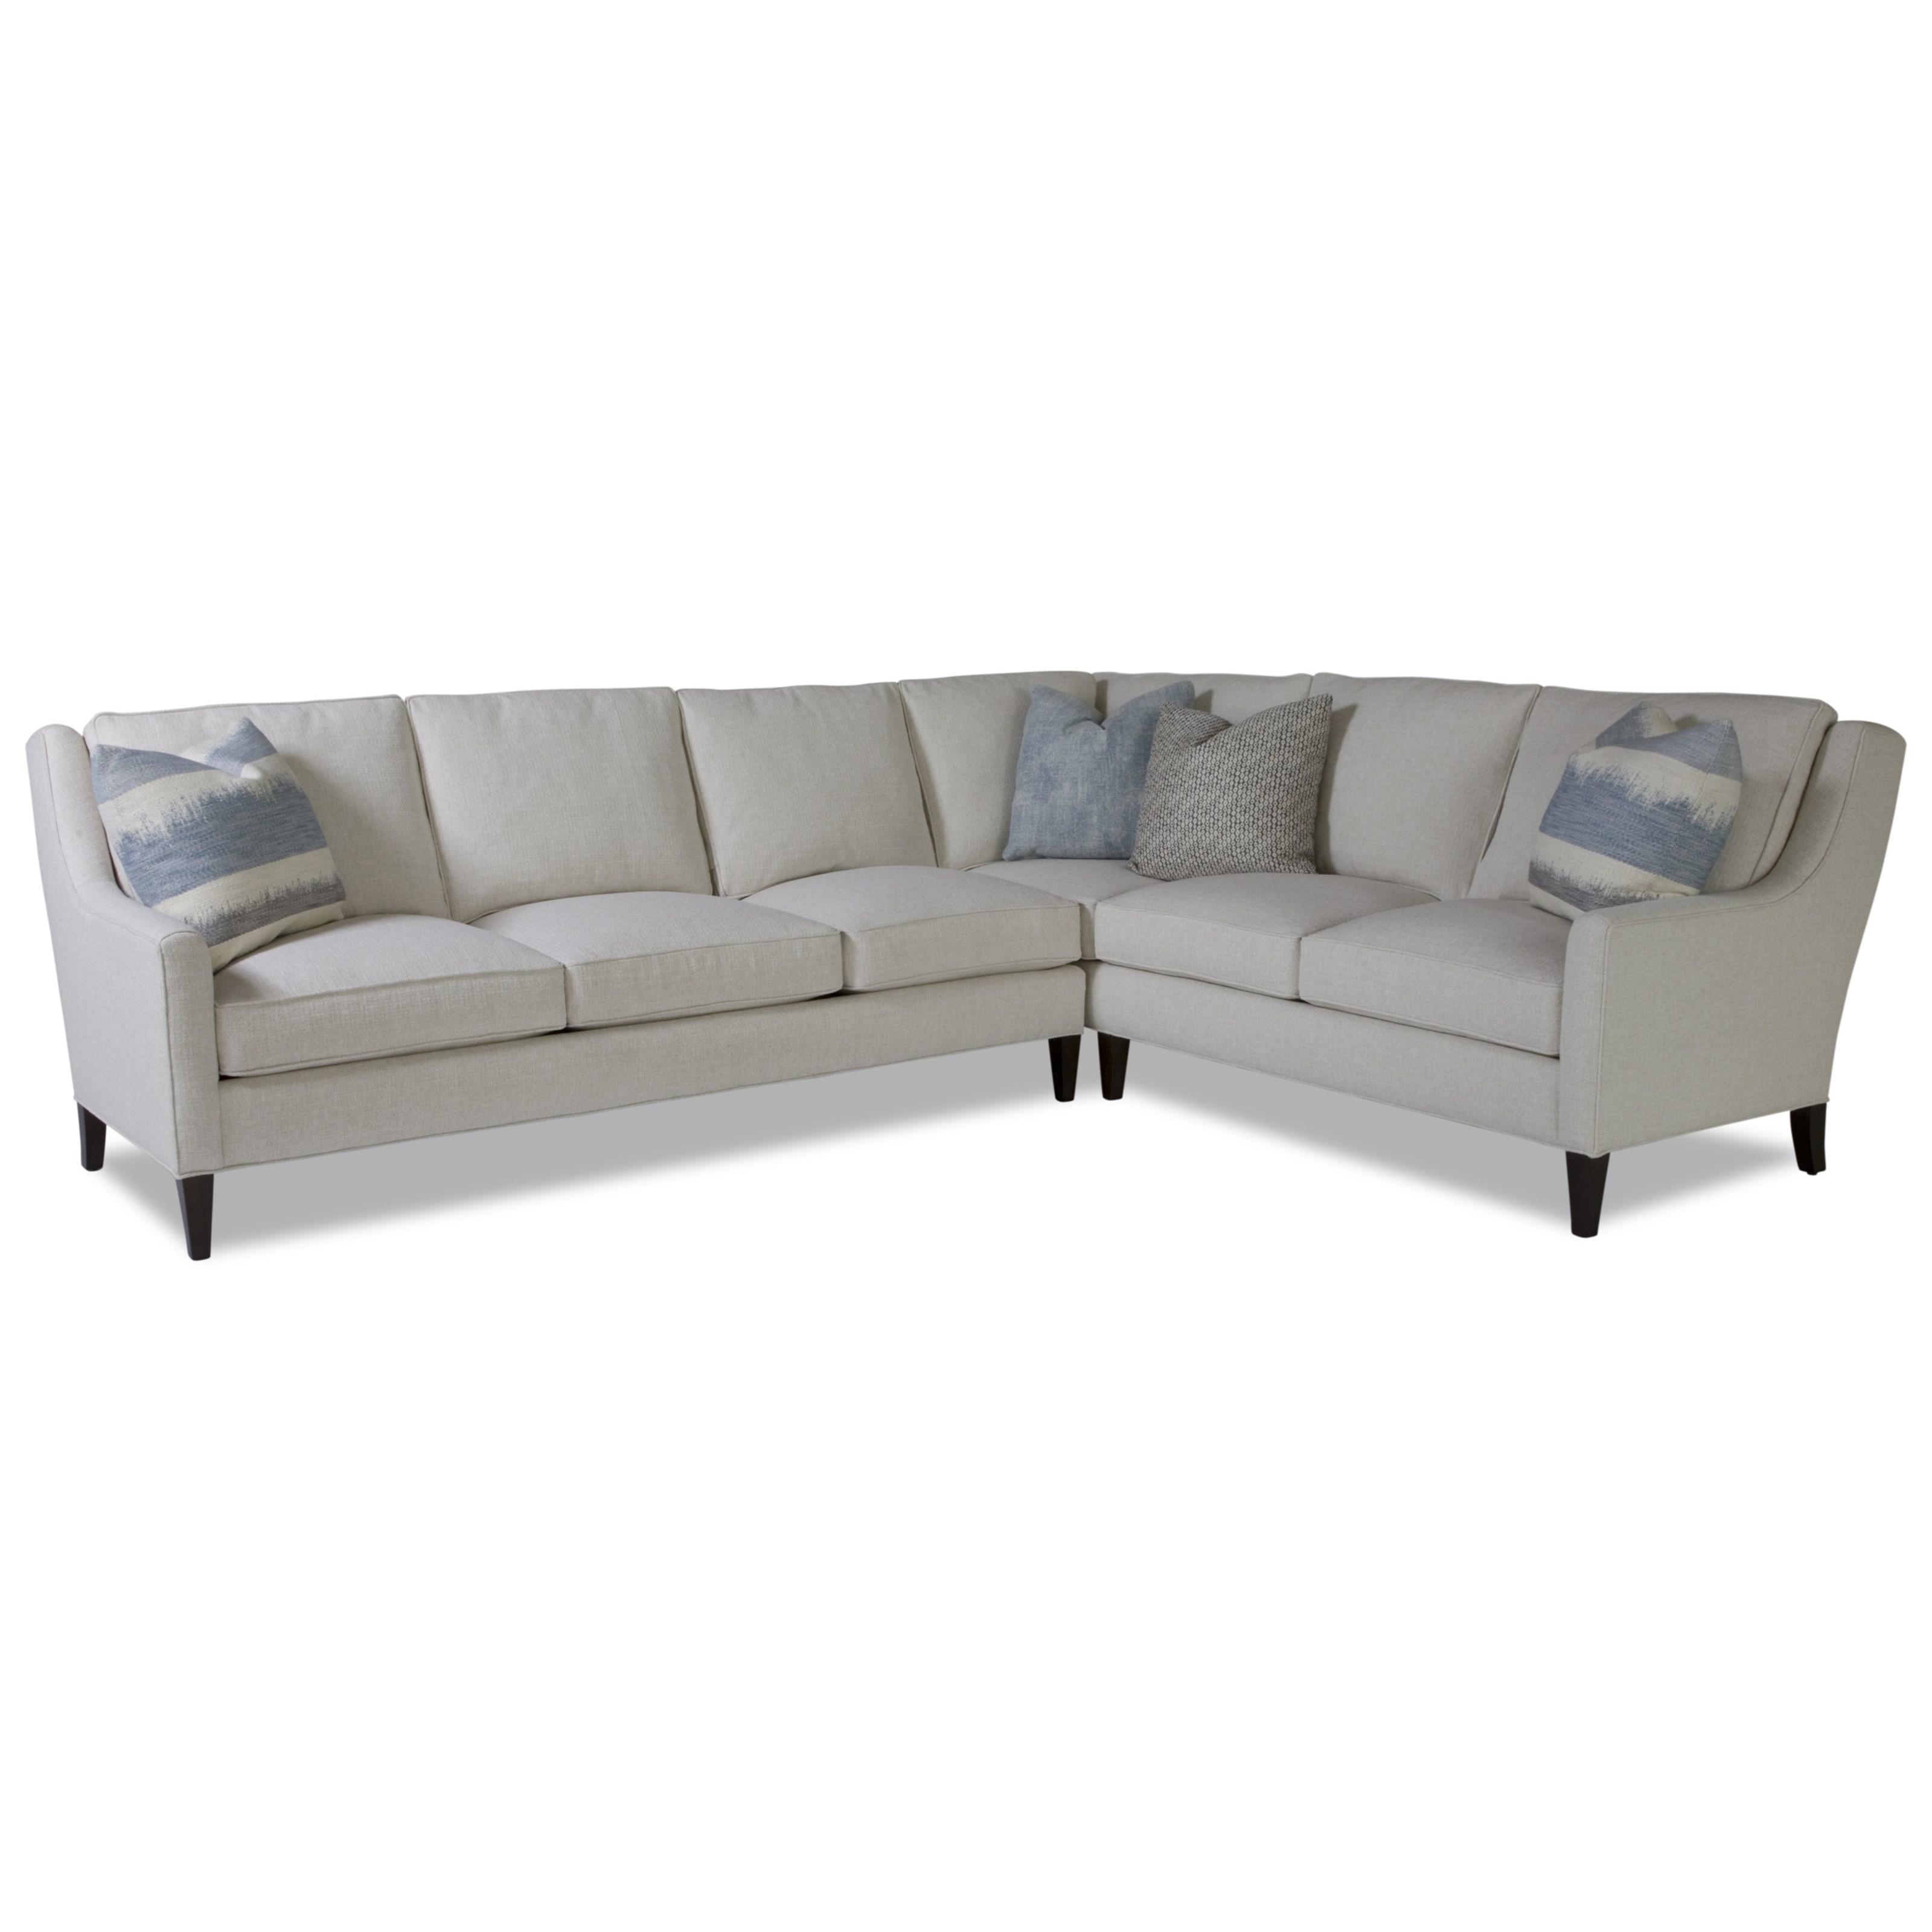 Awe Inspiring Huntington House Laguna Contemporary Sectional Sofa With Pabps2019 Chair Design Images Pabps2019Com